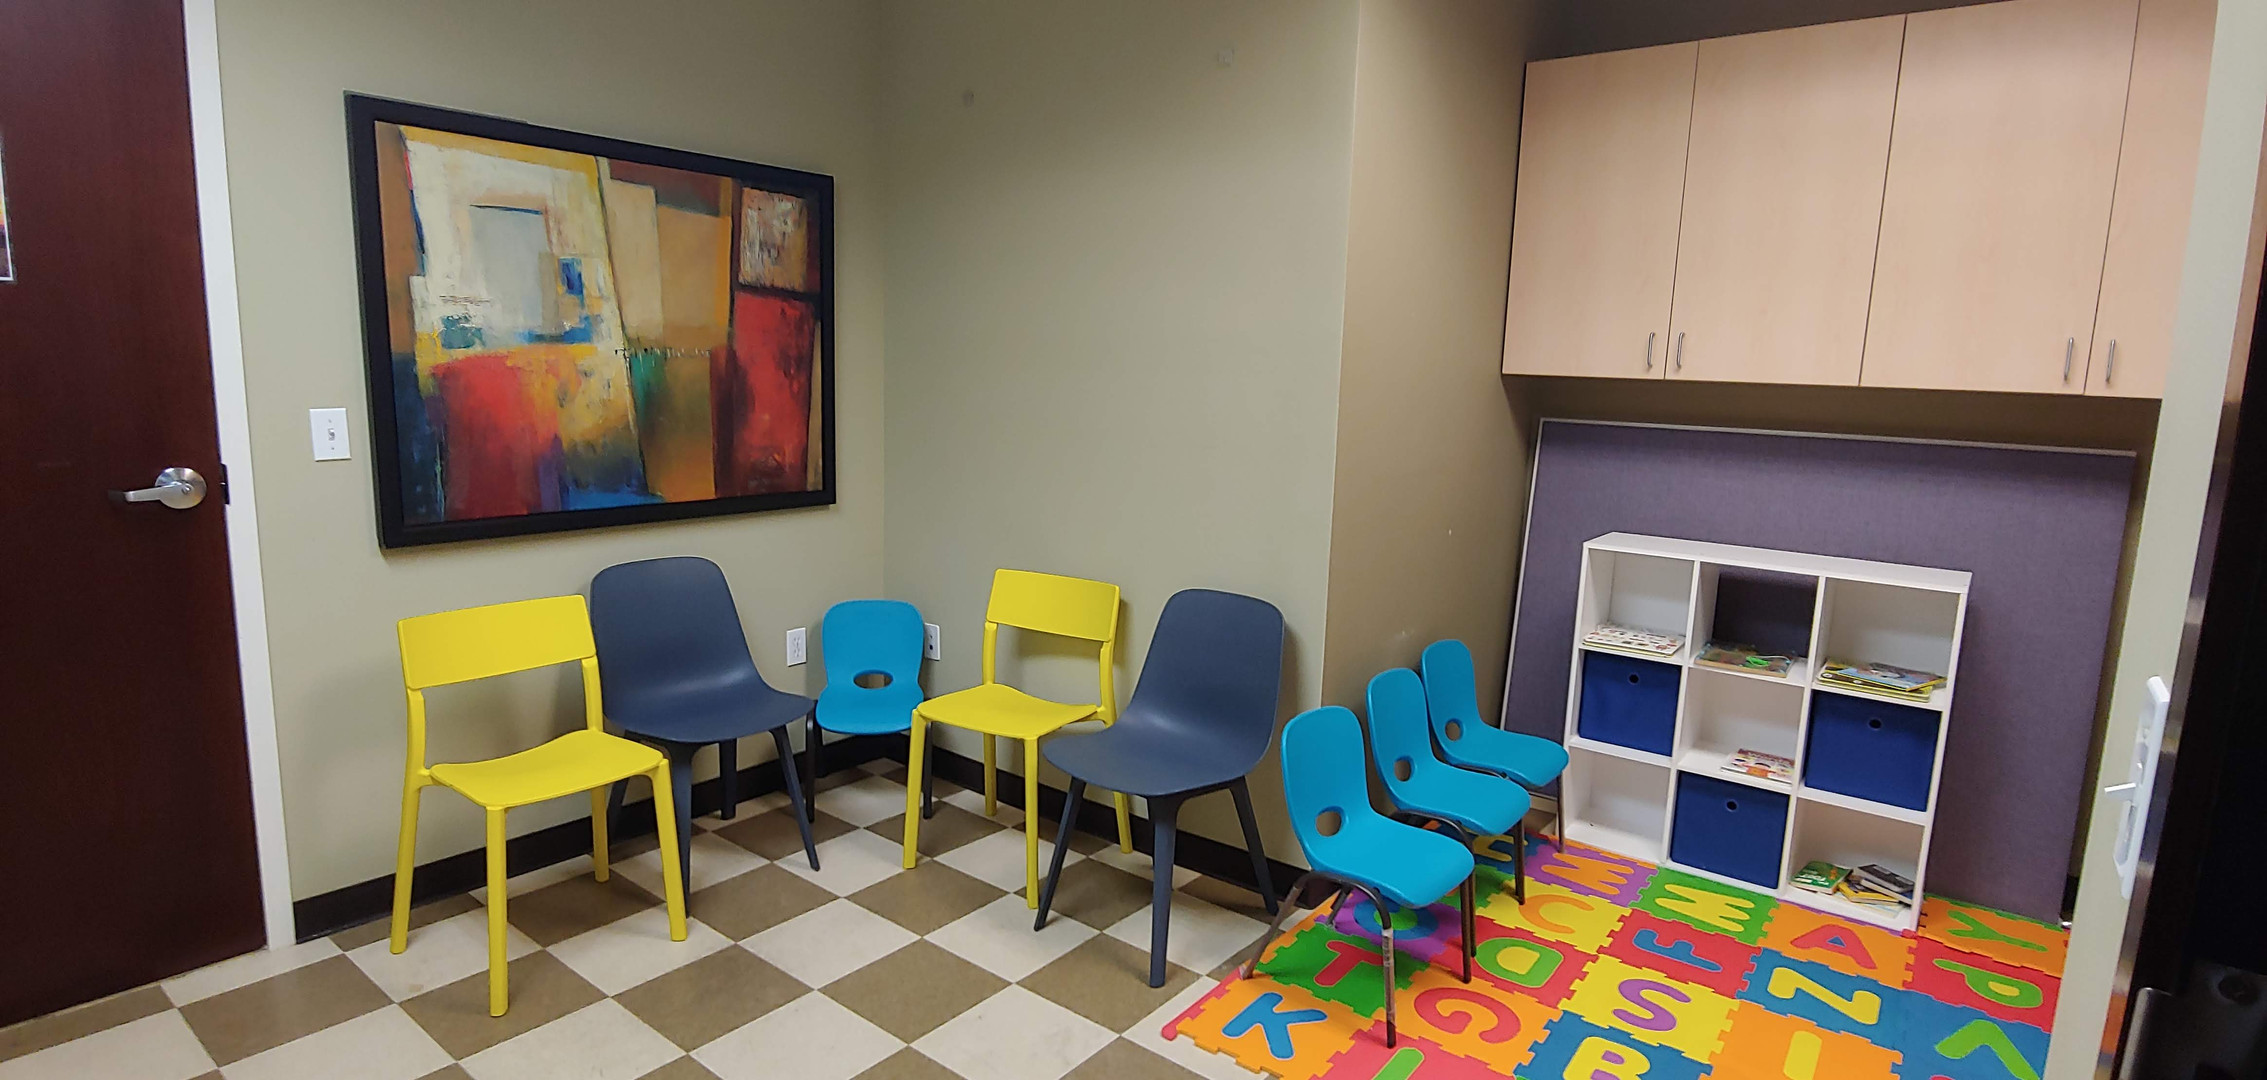 Port Orchard Clinic Waiting Room.jpg